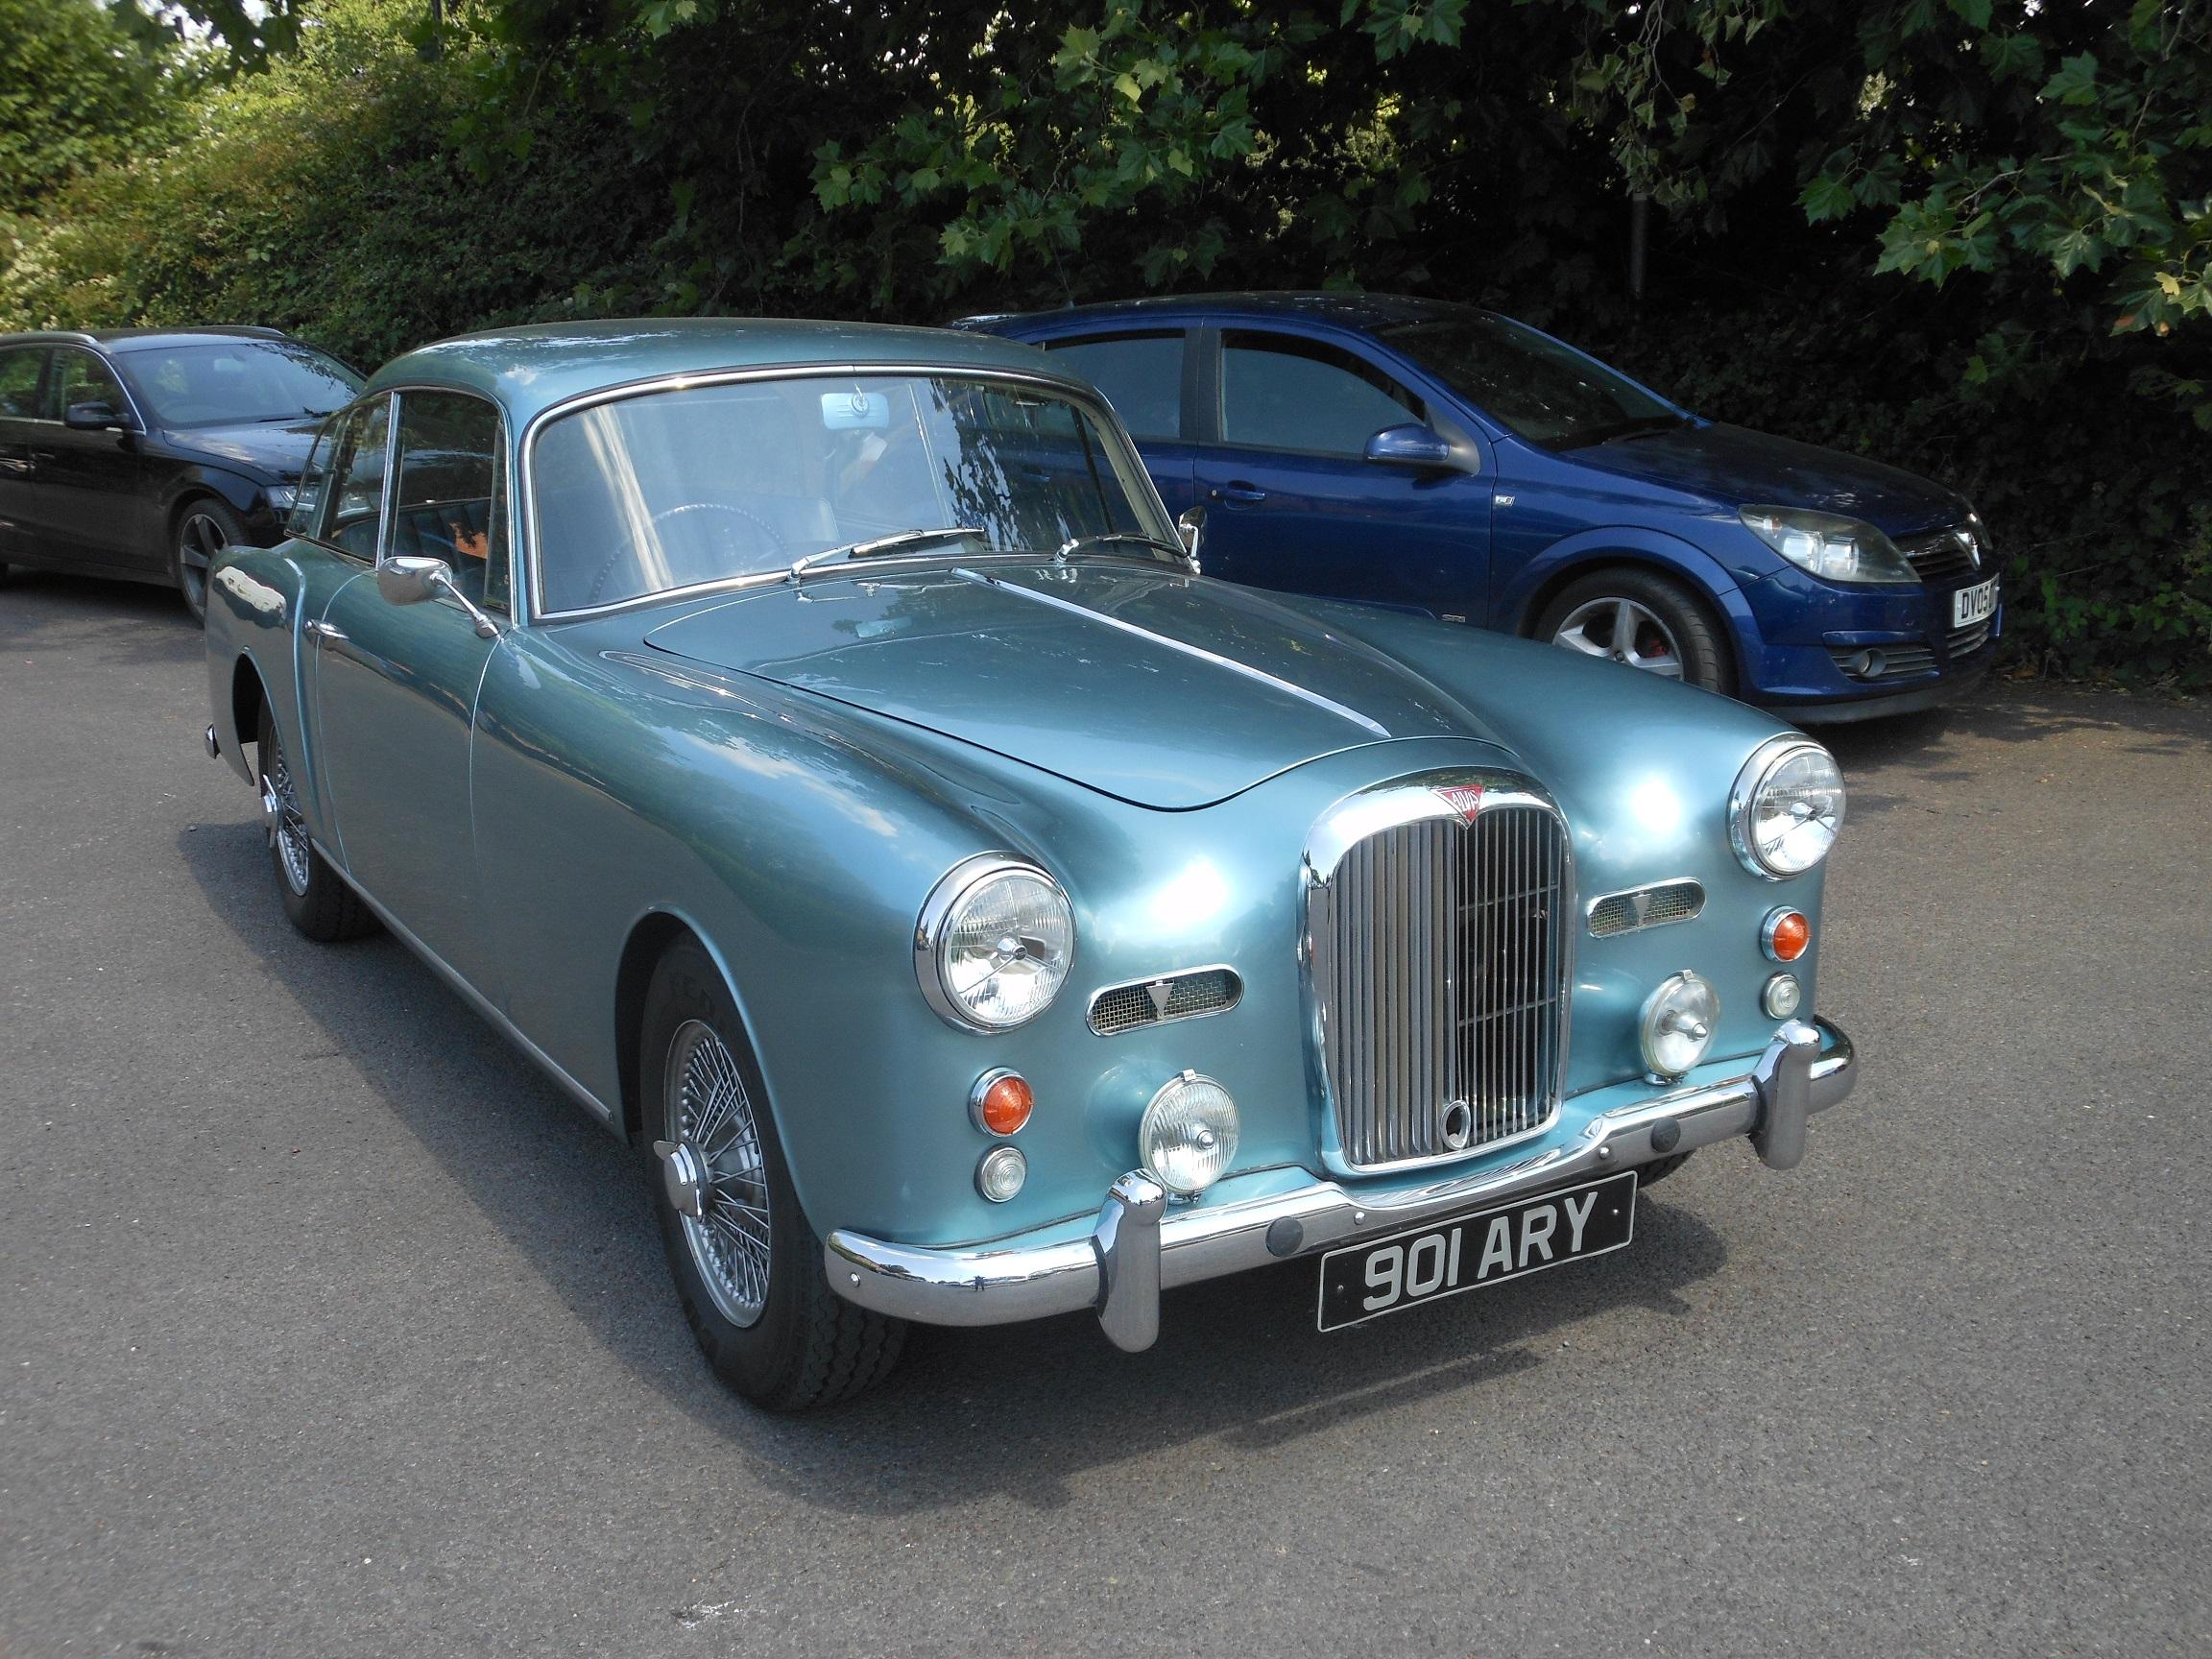 1961 Alvis TD21 Series 1 Park Ward